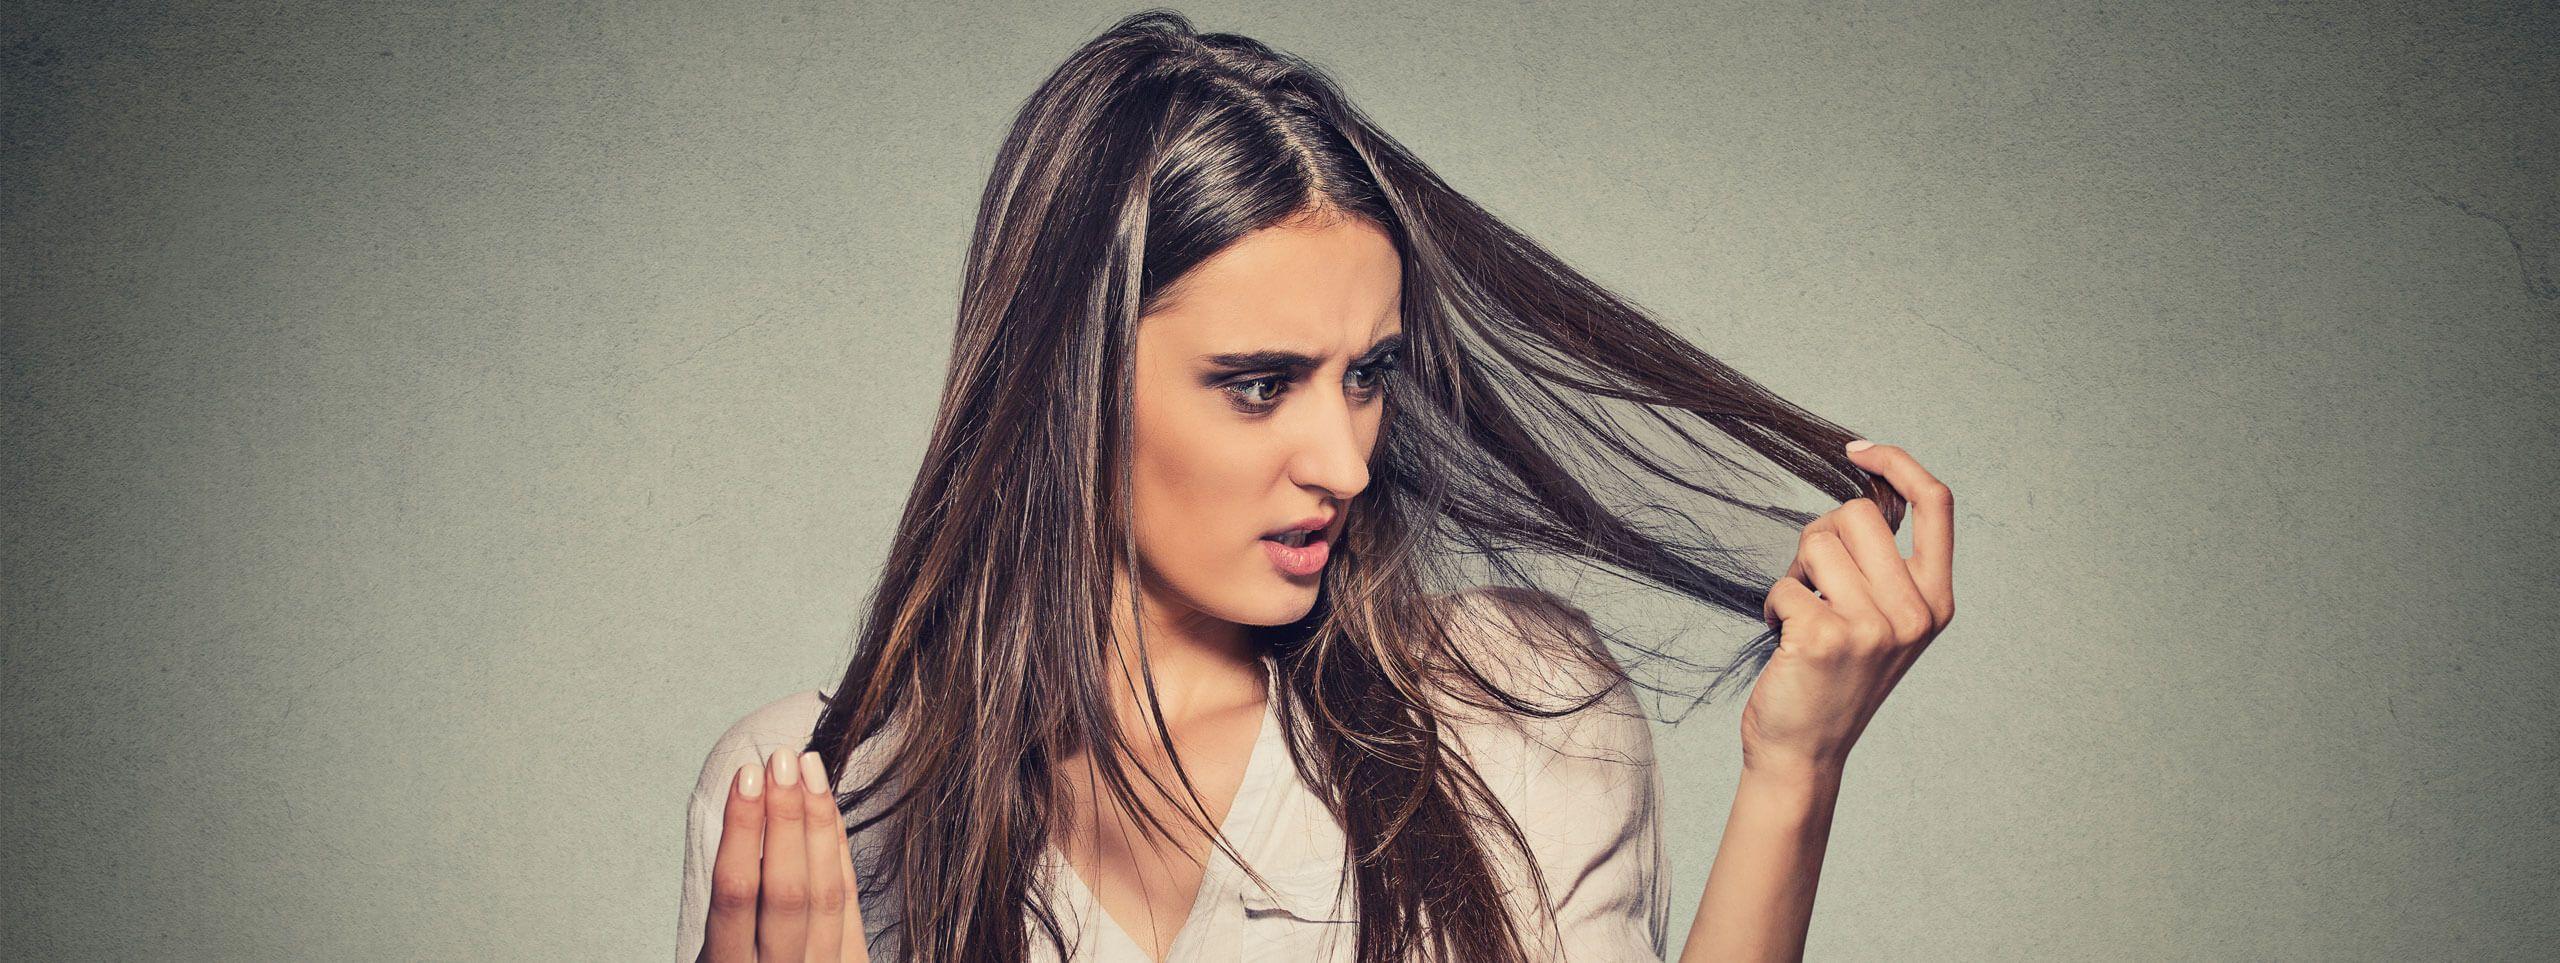 Donna preoccupata per caduta capelli